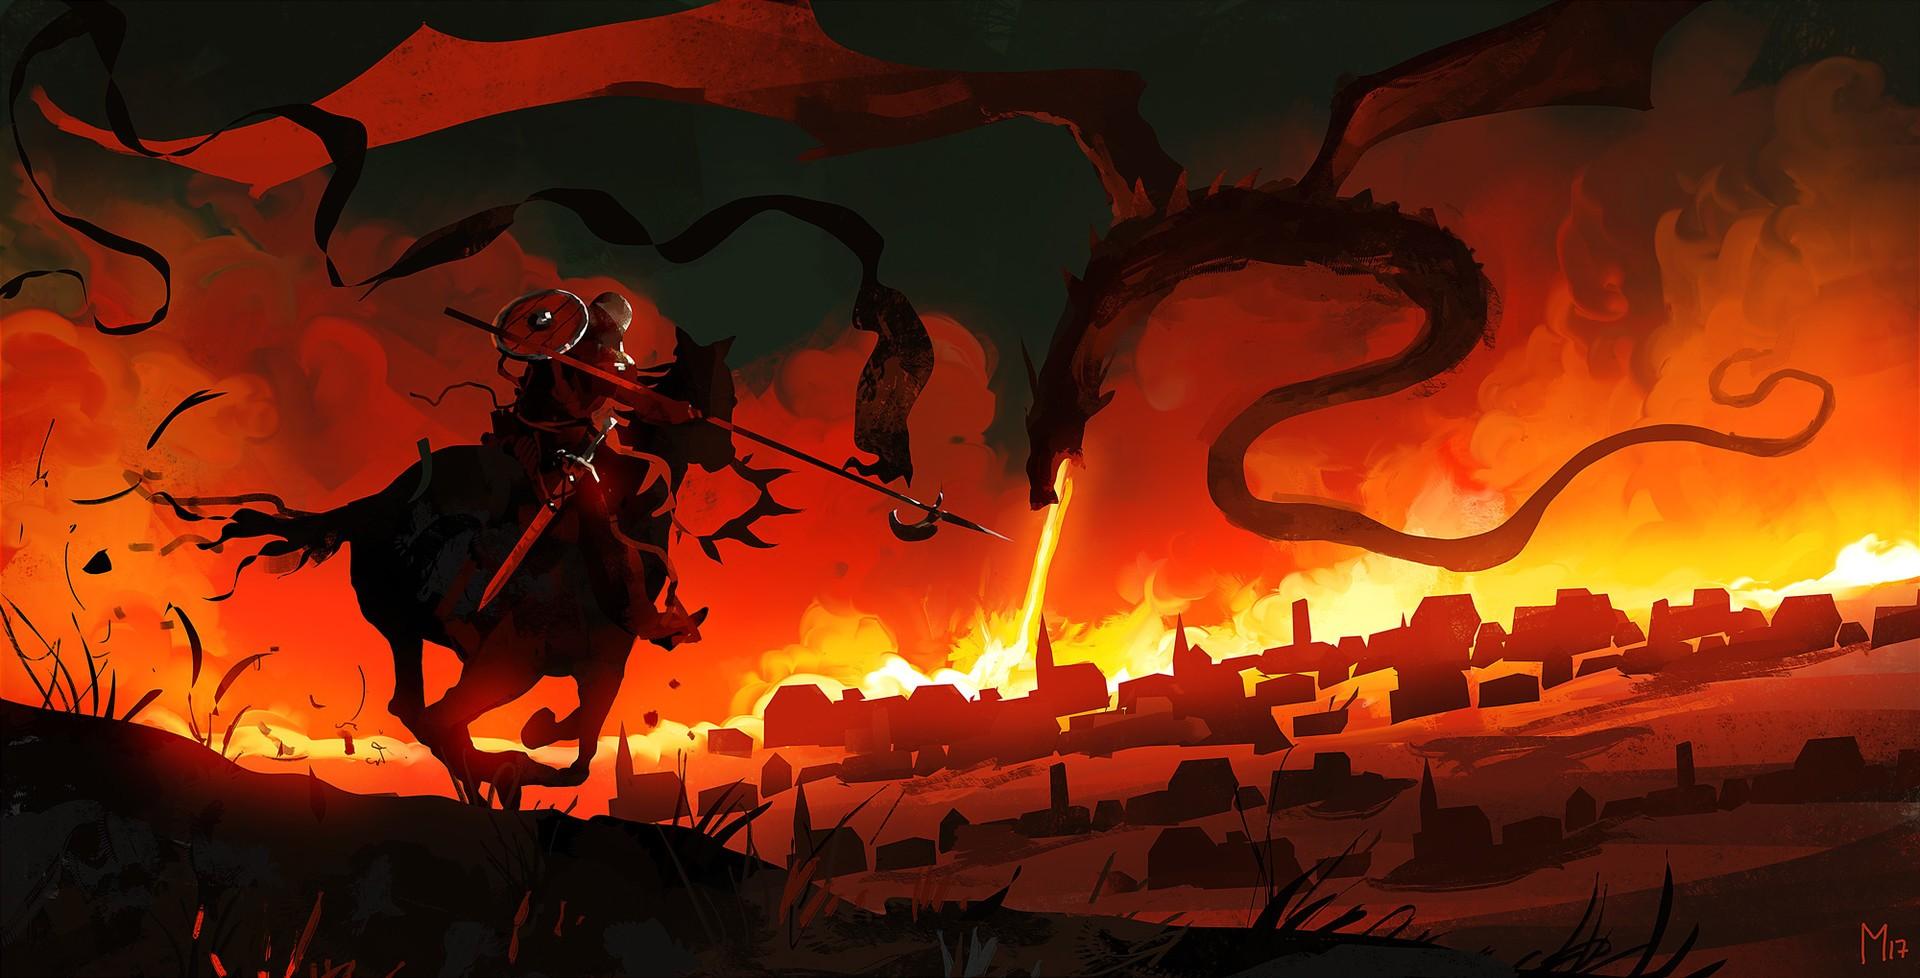 Heavy Bikes And Cars Wallpapers Free Download Fantasy Art Digital Art Artwork Dragon Fire Knight